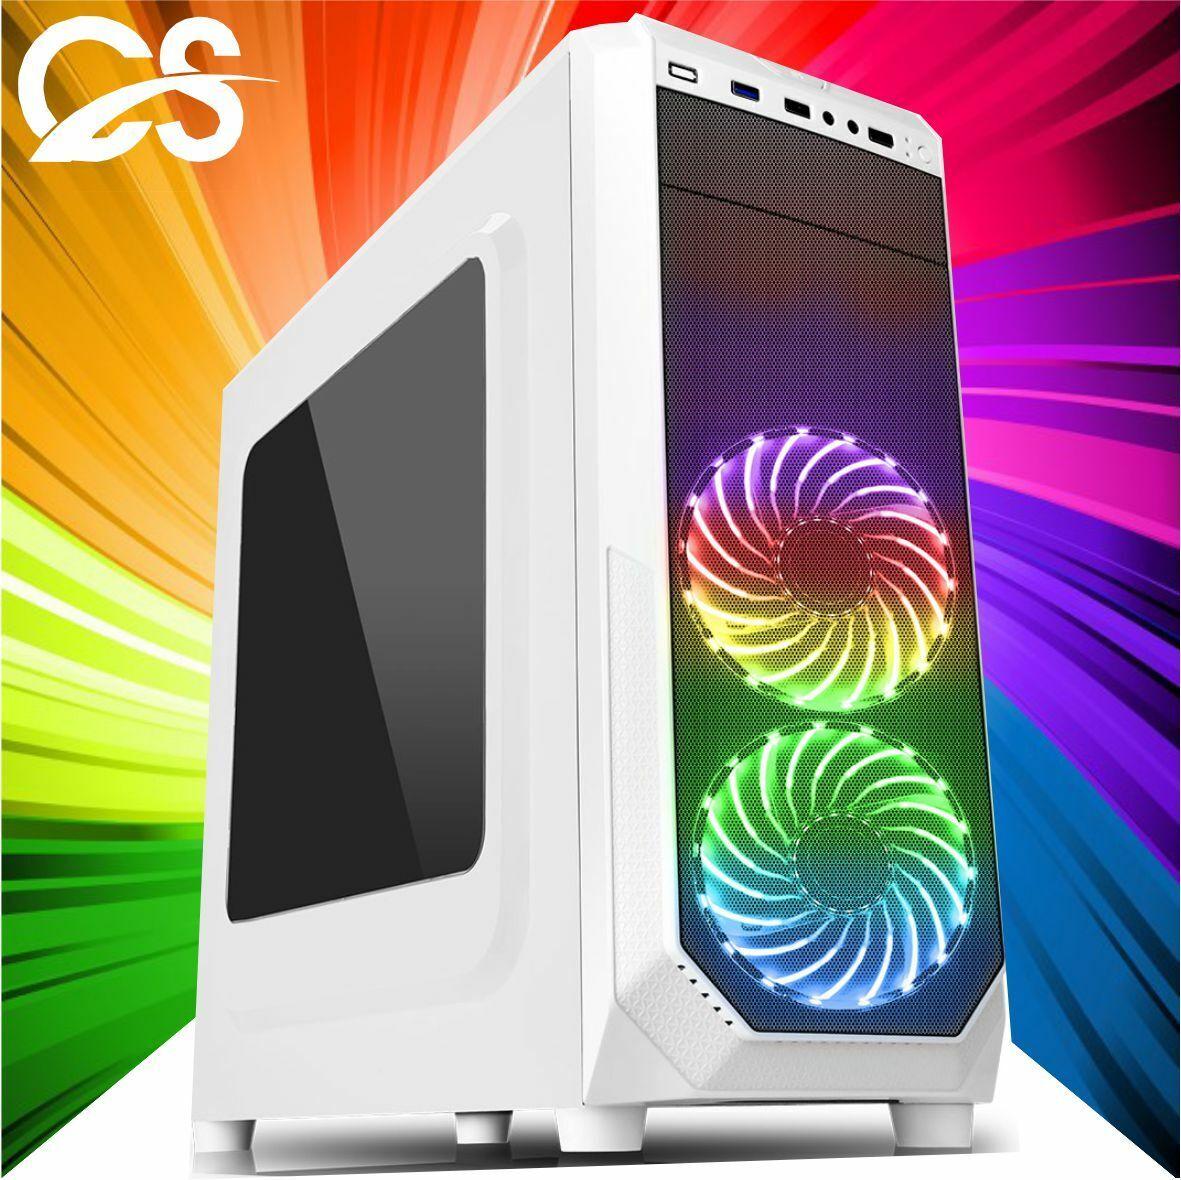 Computer Games - ULTRA FAST Gaming PC Computer Intel Quad Core i5 8GB 1TB Win10 2GB GT710 CHEAP